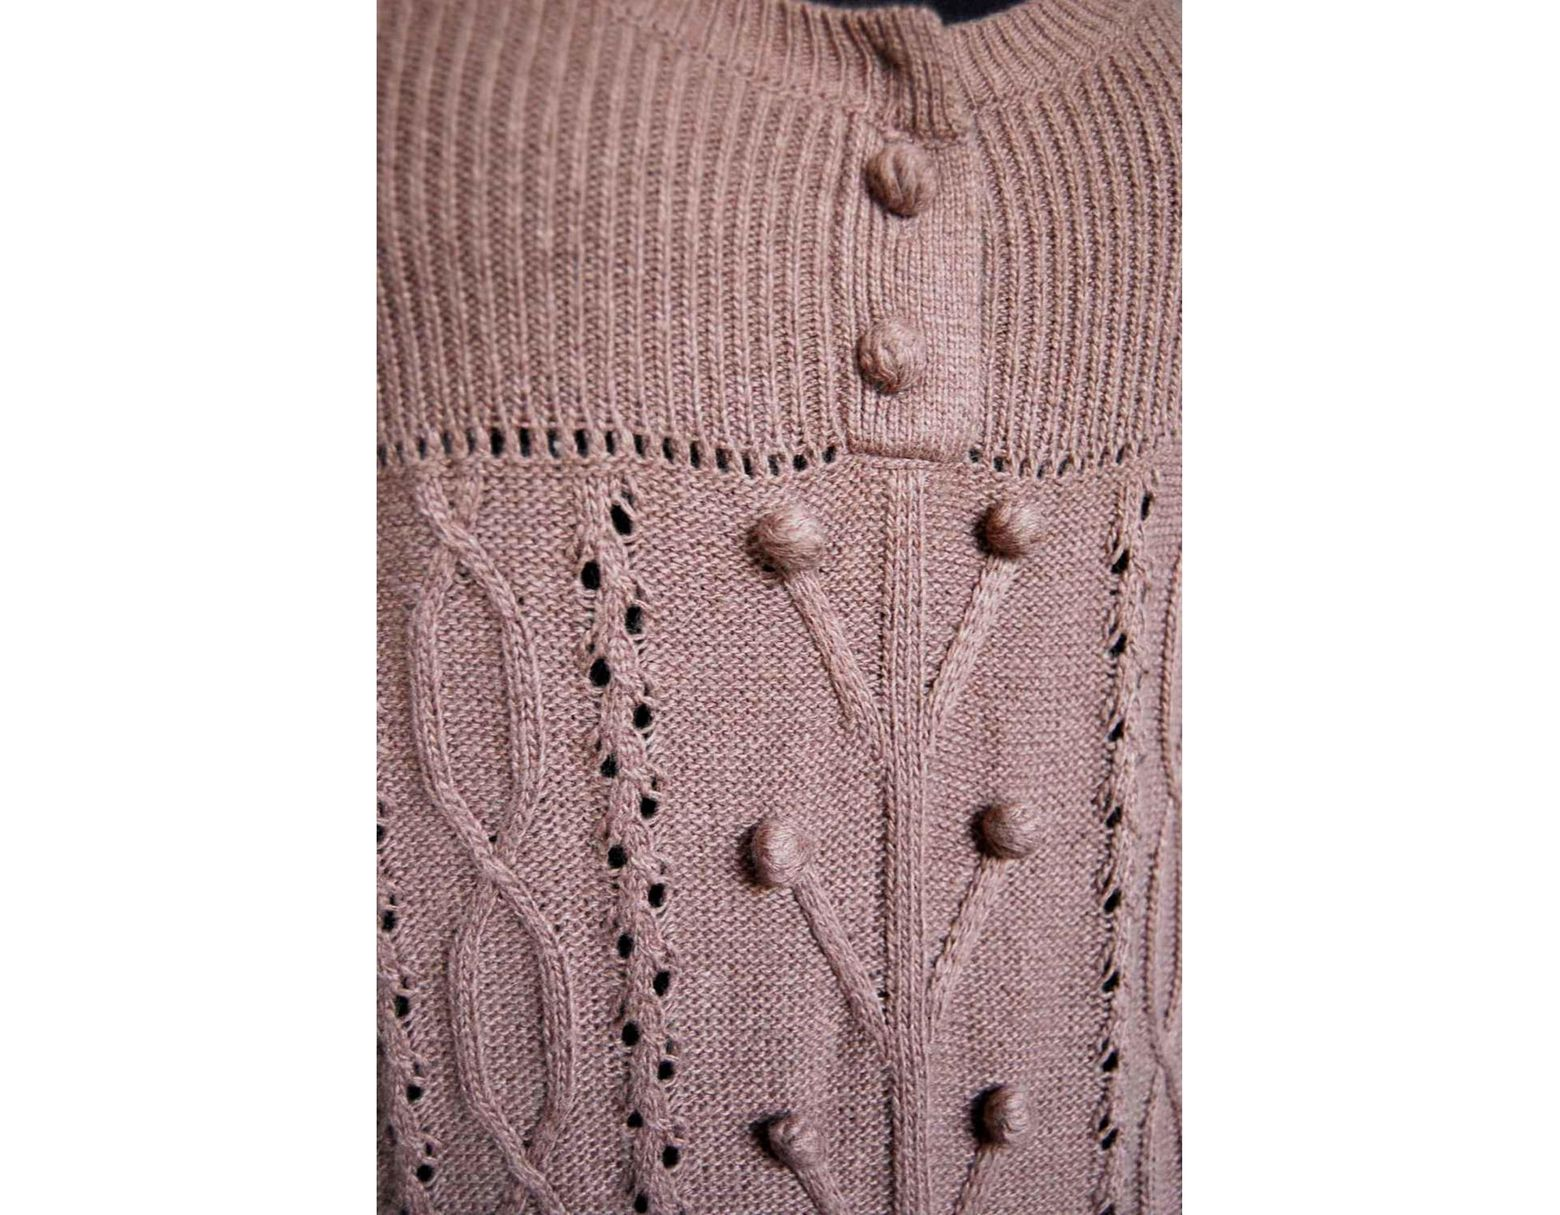 Pull Femme Robe Robe Coton Pull Marron TF1JK3lc